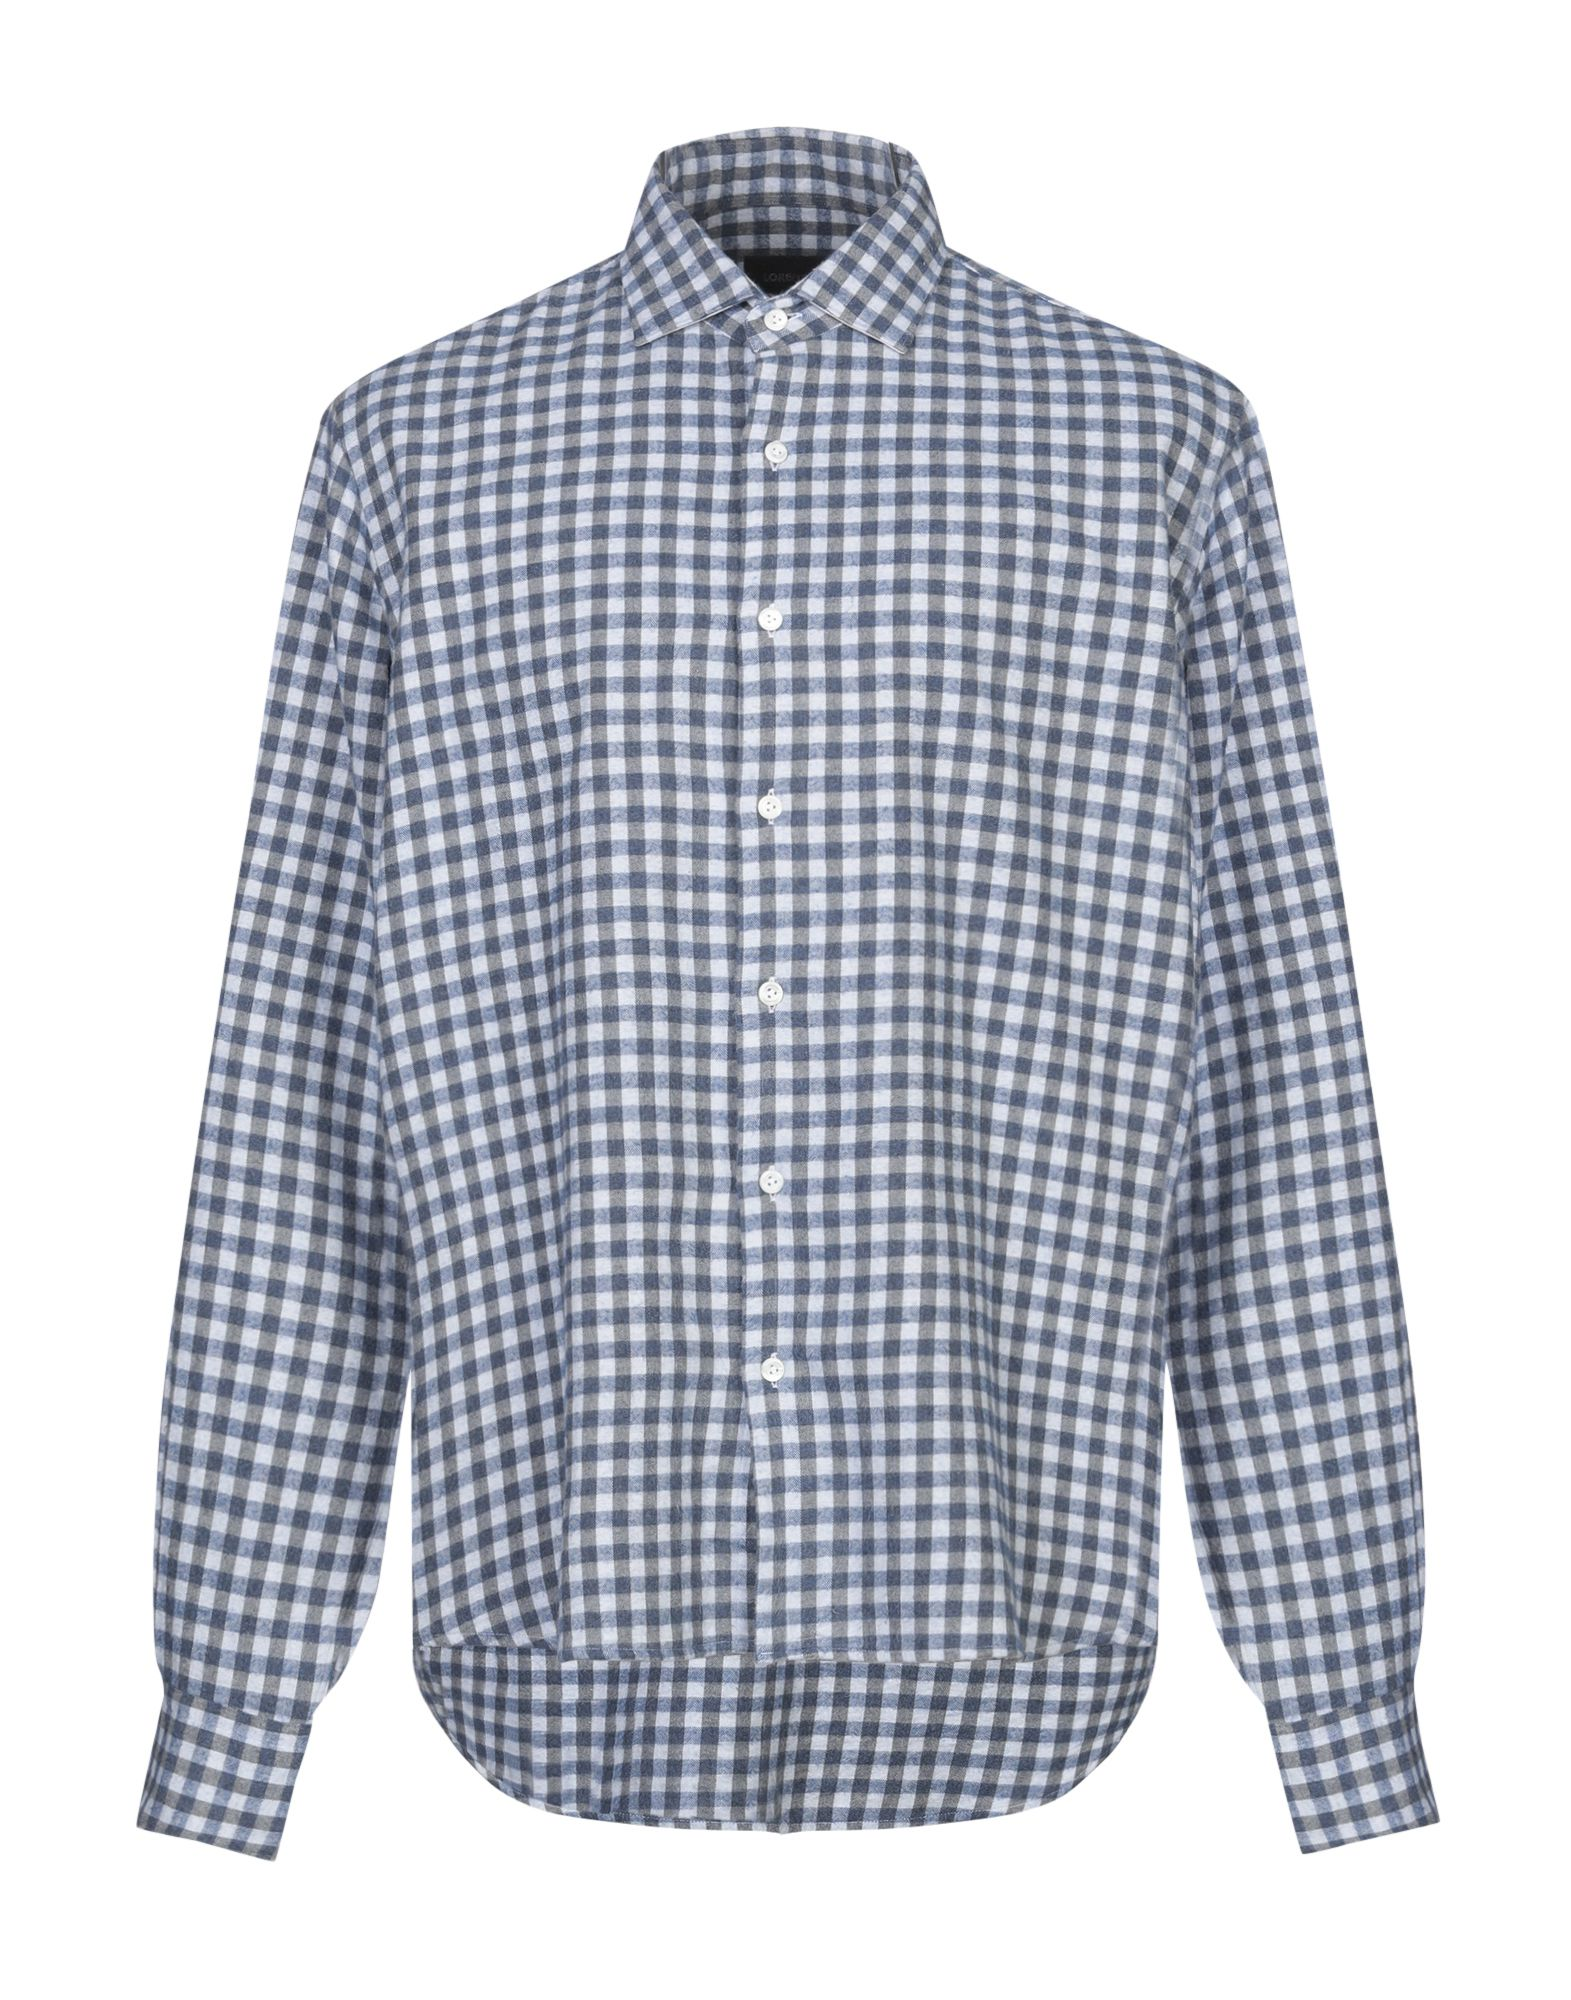 Camicia Camicia A Quadri Lorenzini uomo - 38846339BB  Verkauf mit hohem Rabatt